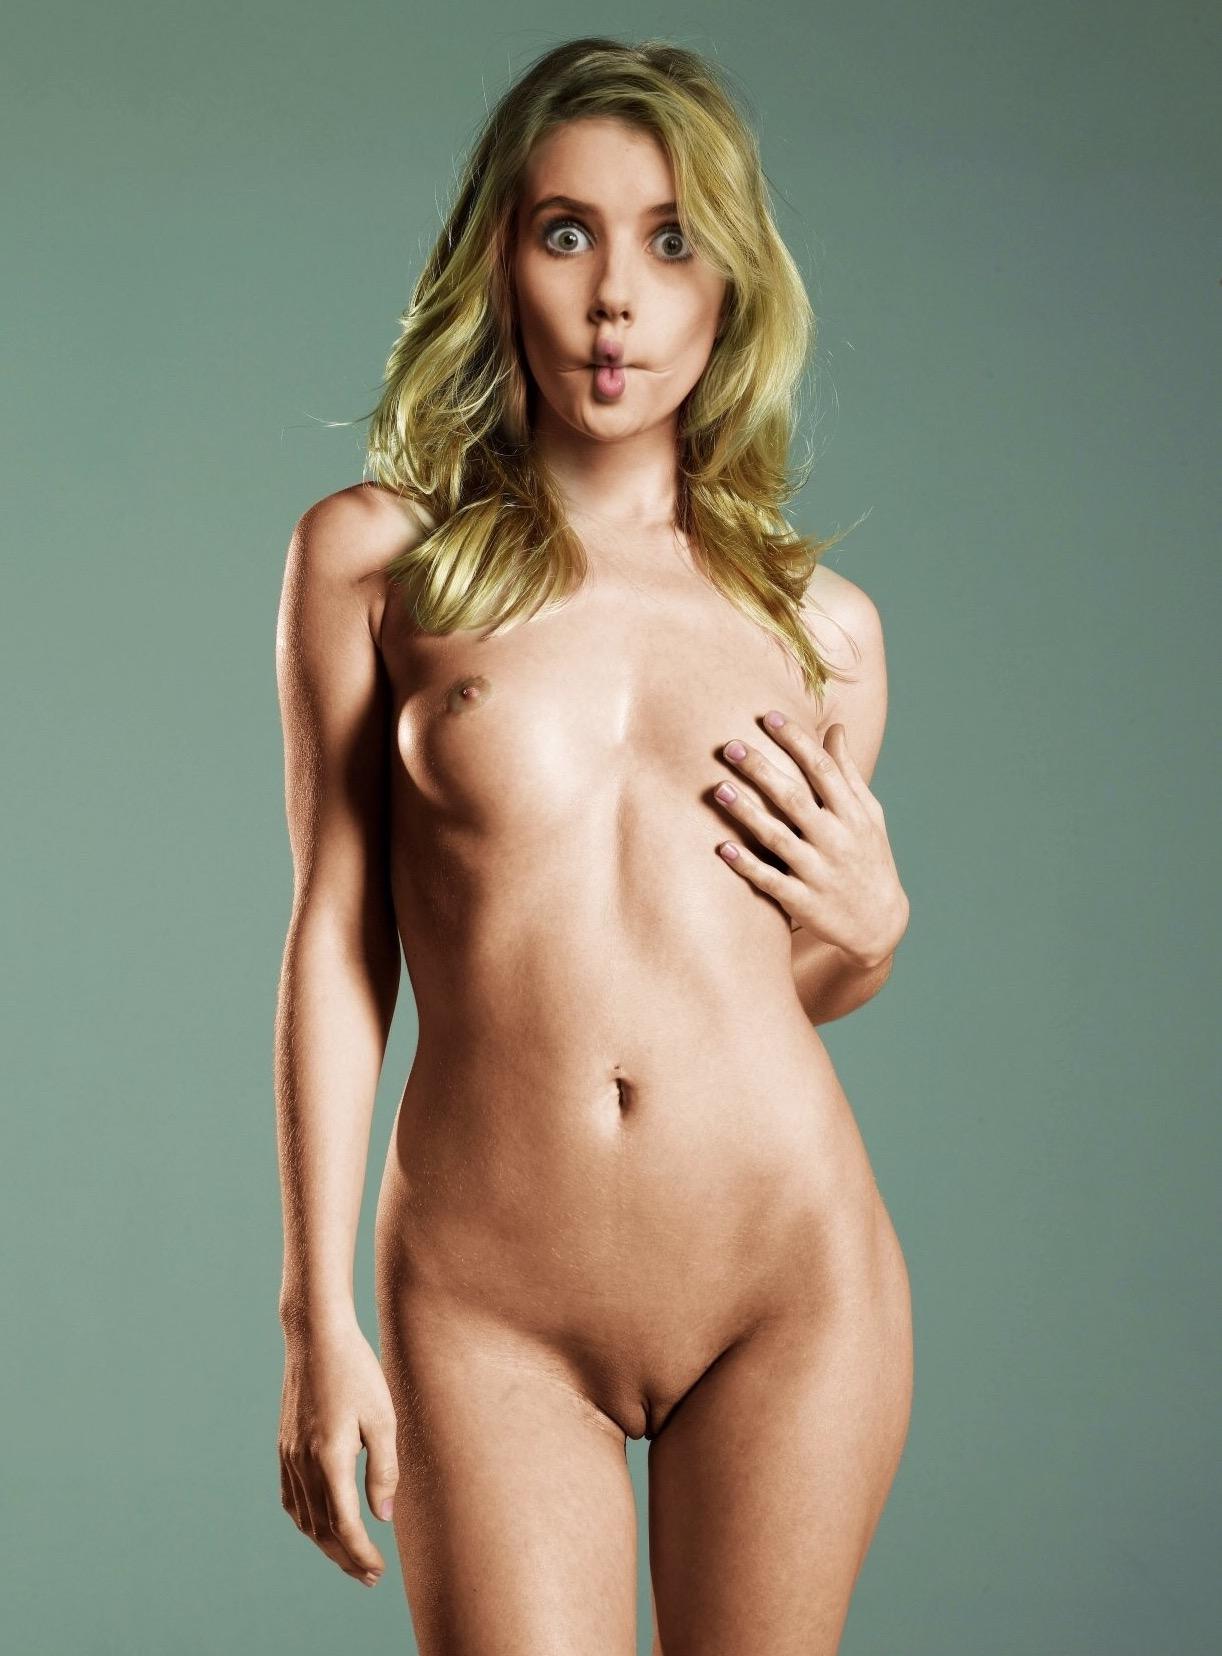 Emma roberts nude celebrity pics